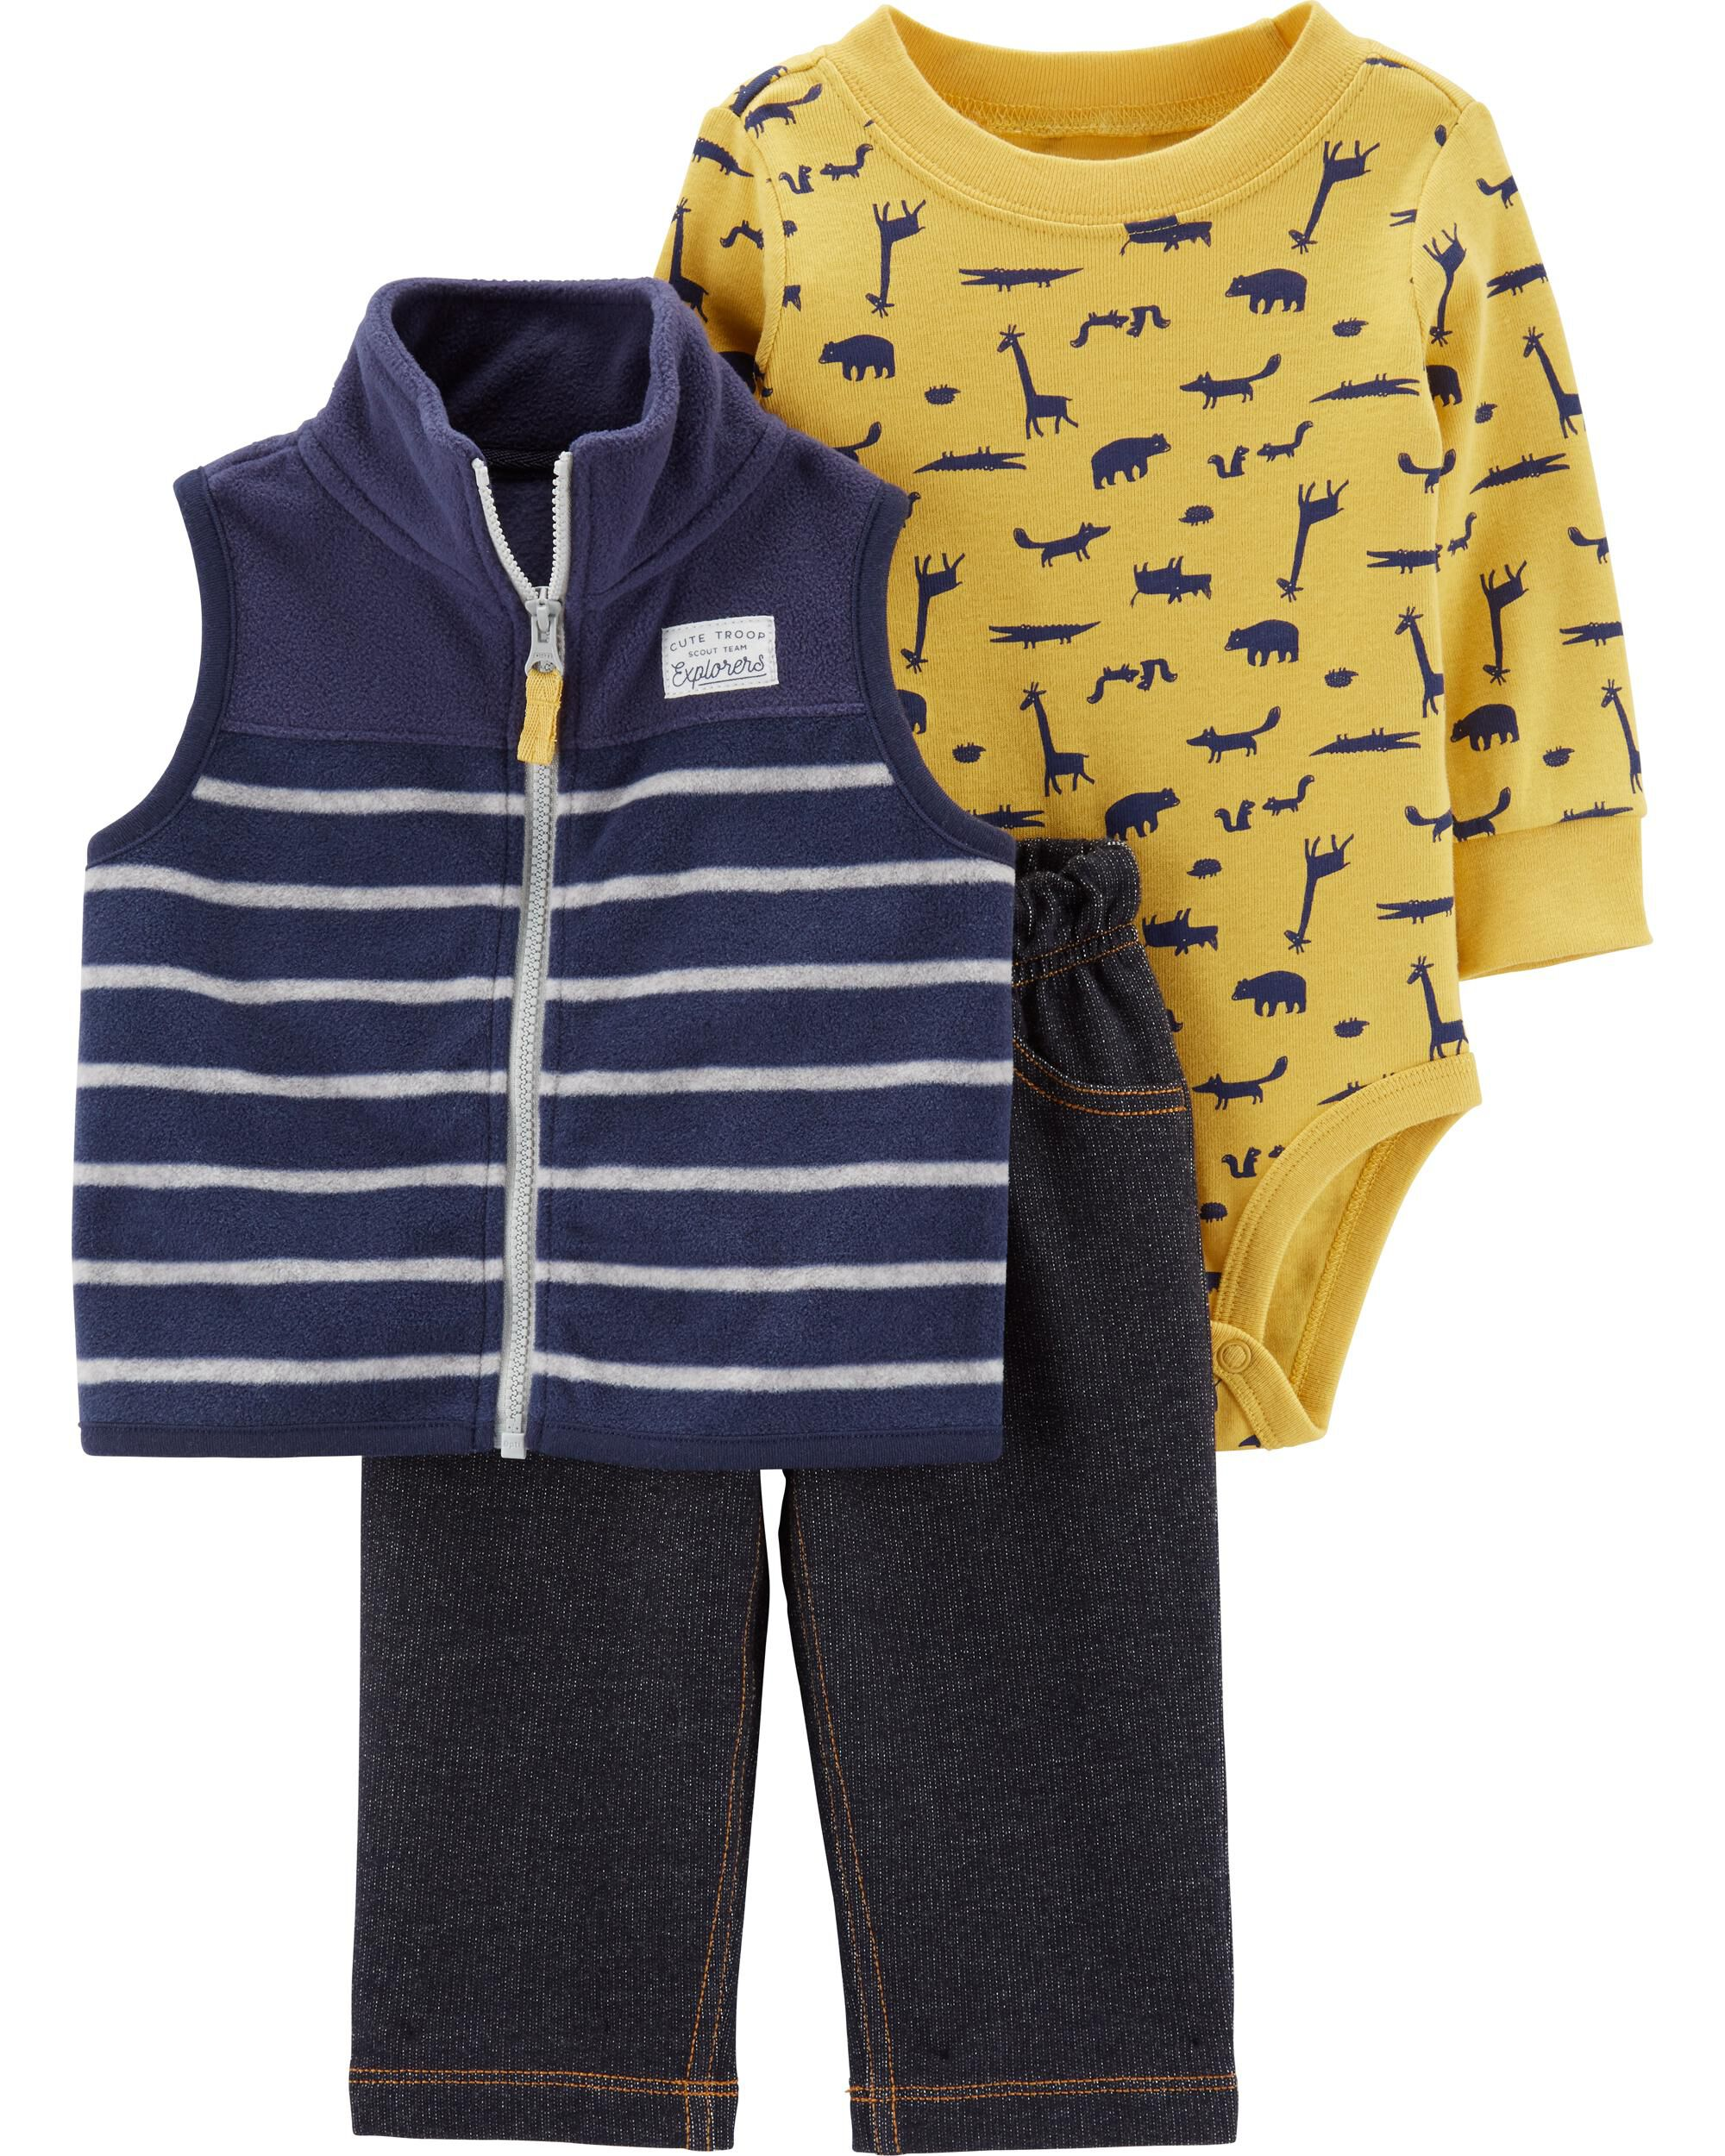 *CLEARANCE* 3-Piece Animal Little Vest Set